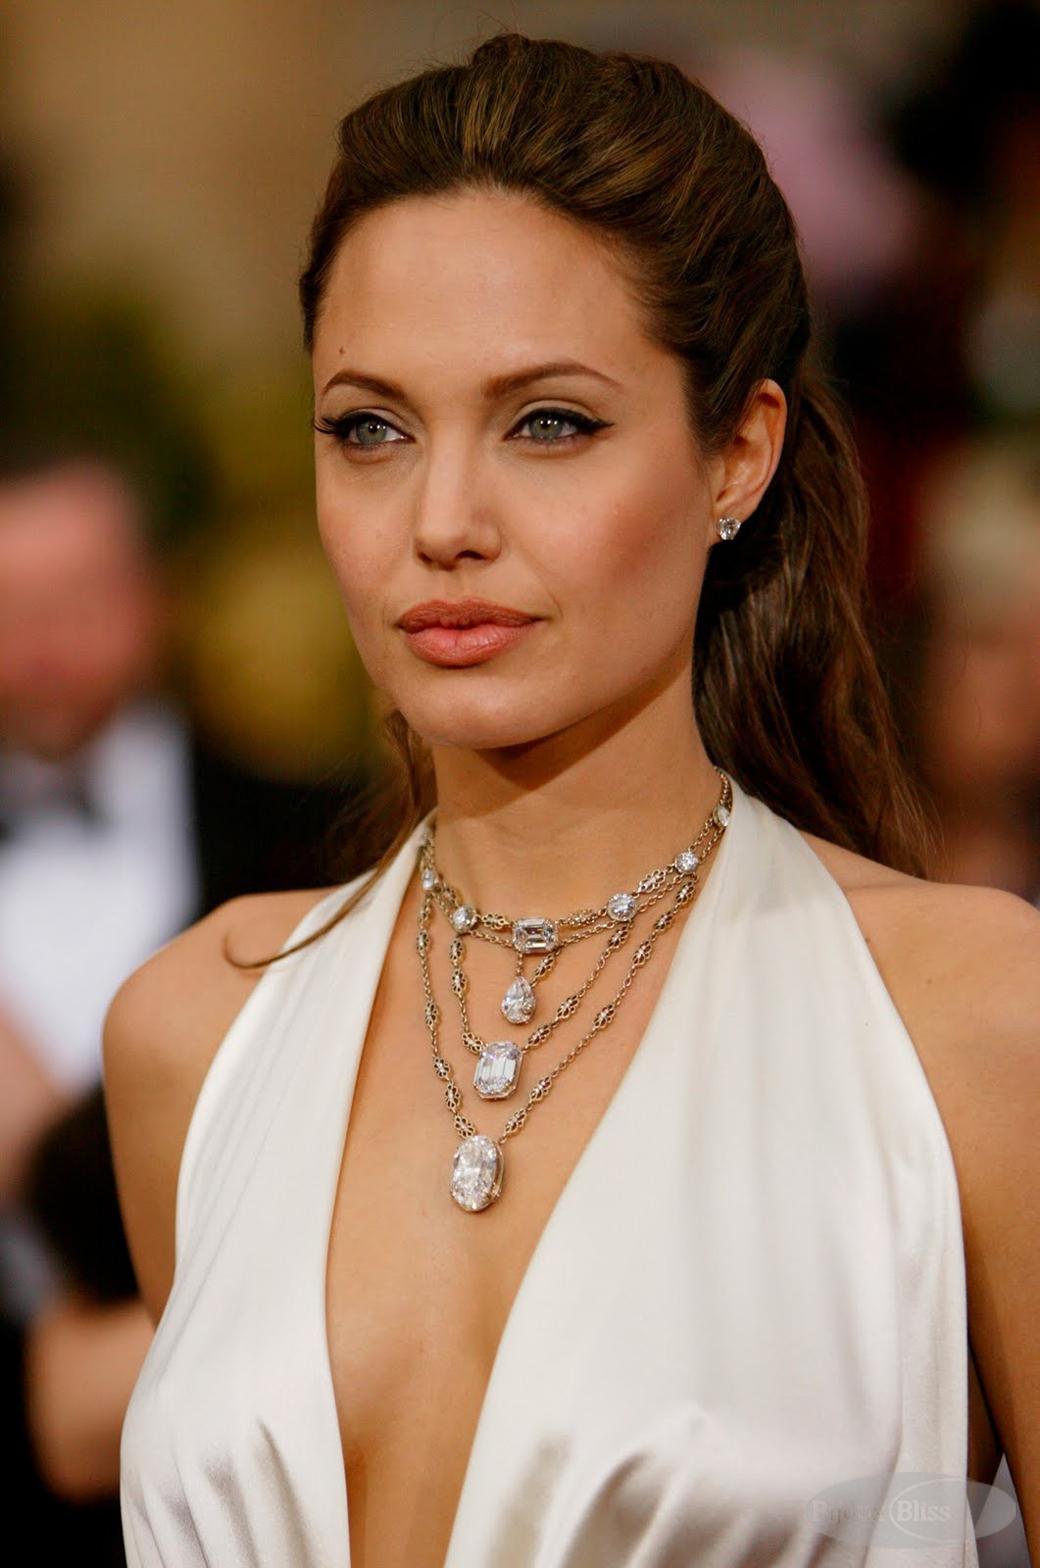 http://2.bp.blogspot.com/-VjizmaPEnhE/USus5QiyfJI/AAAAAAAAFdk/K8vcSdmDkYc/s1600/Ana-Passos-Joias-Angelina-Jolie-Oscar-2004.jpg